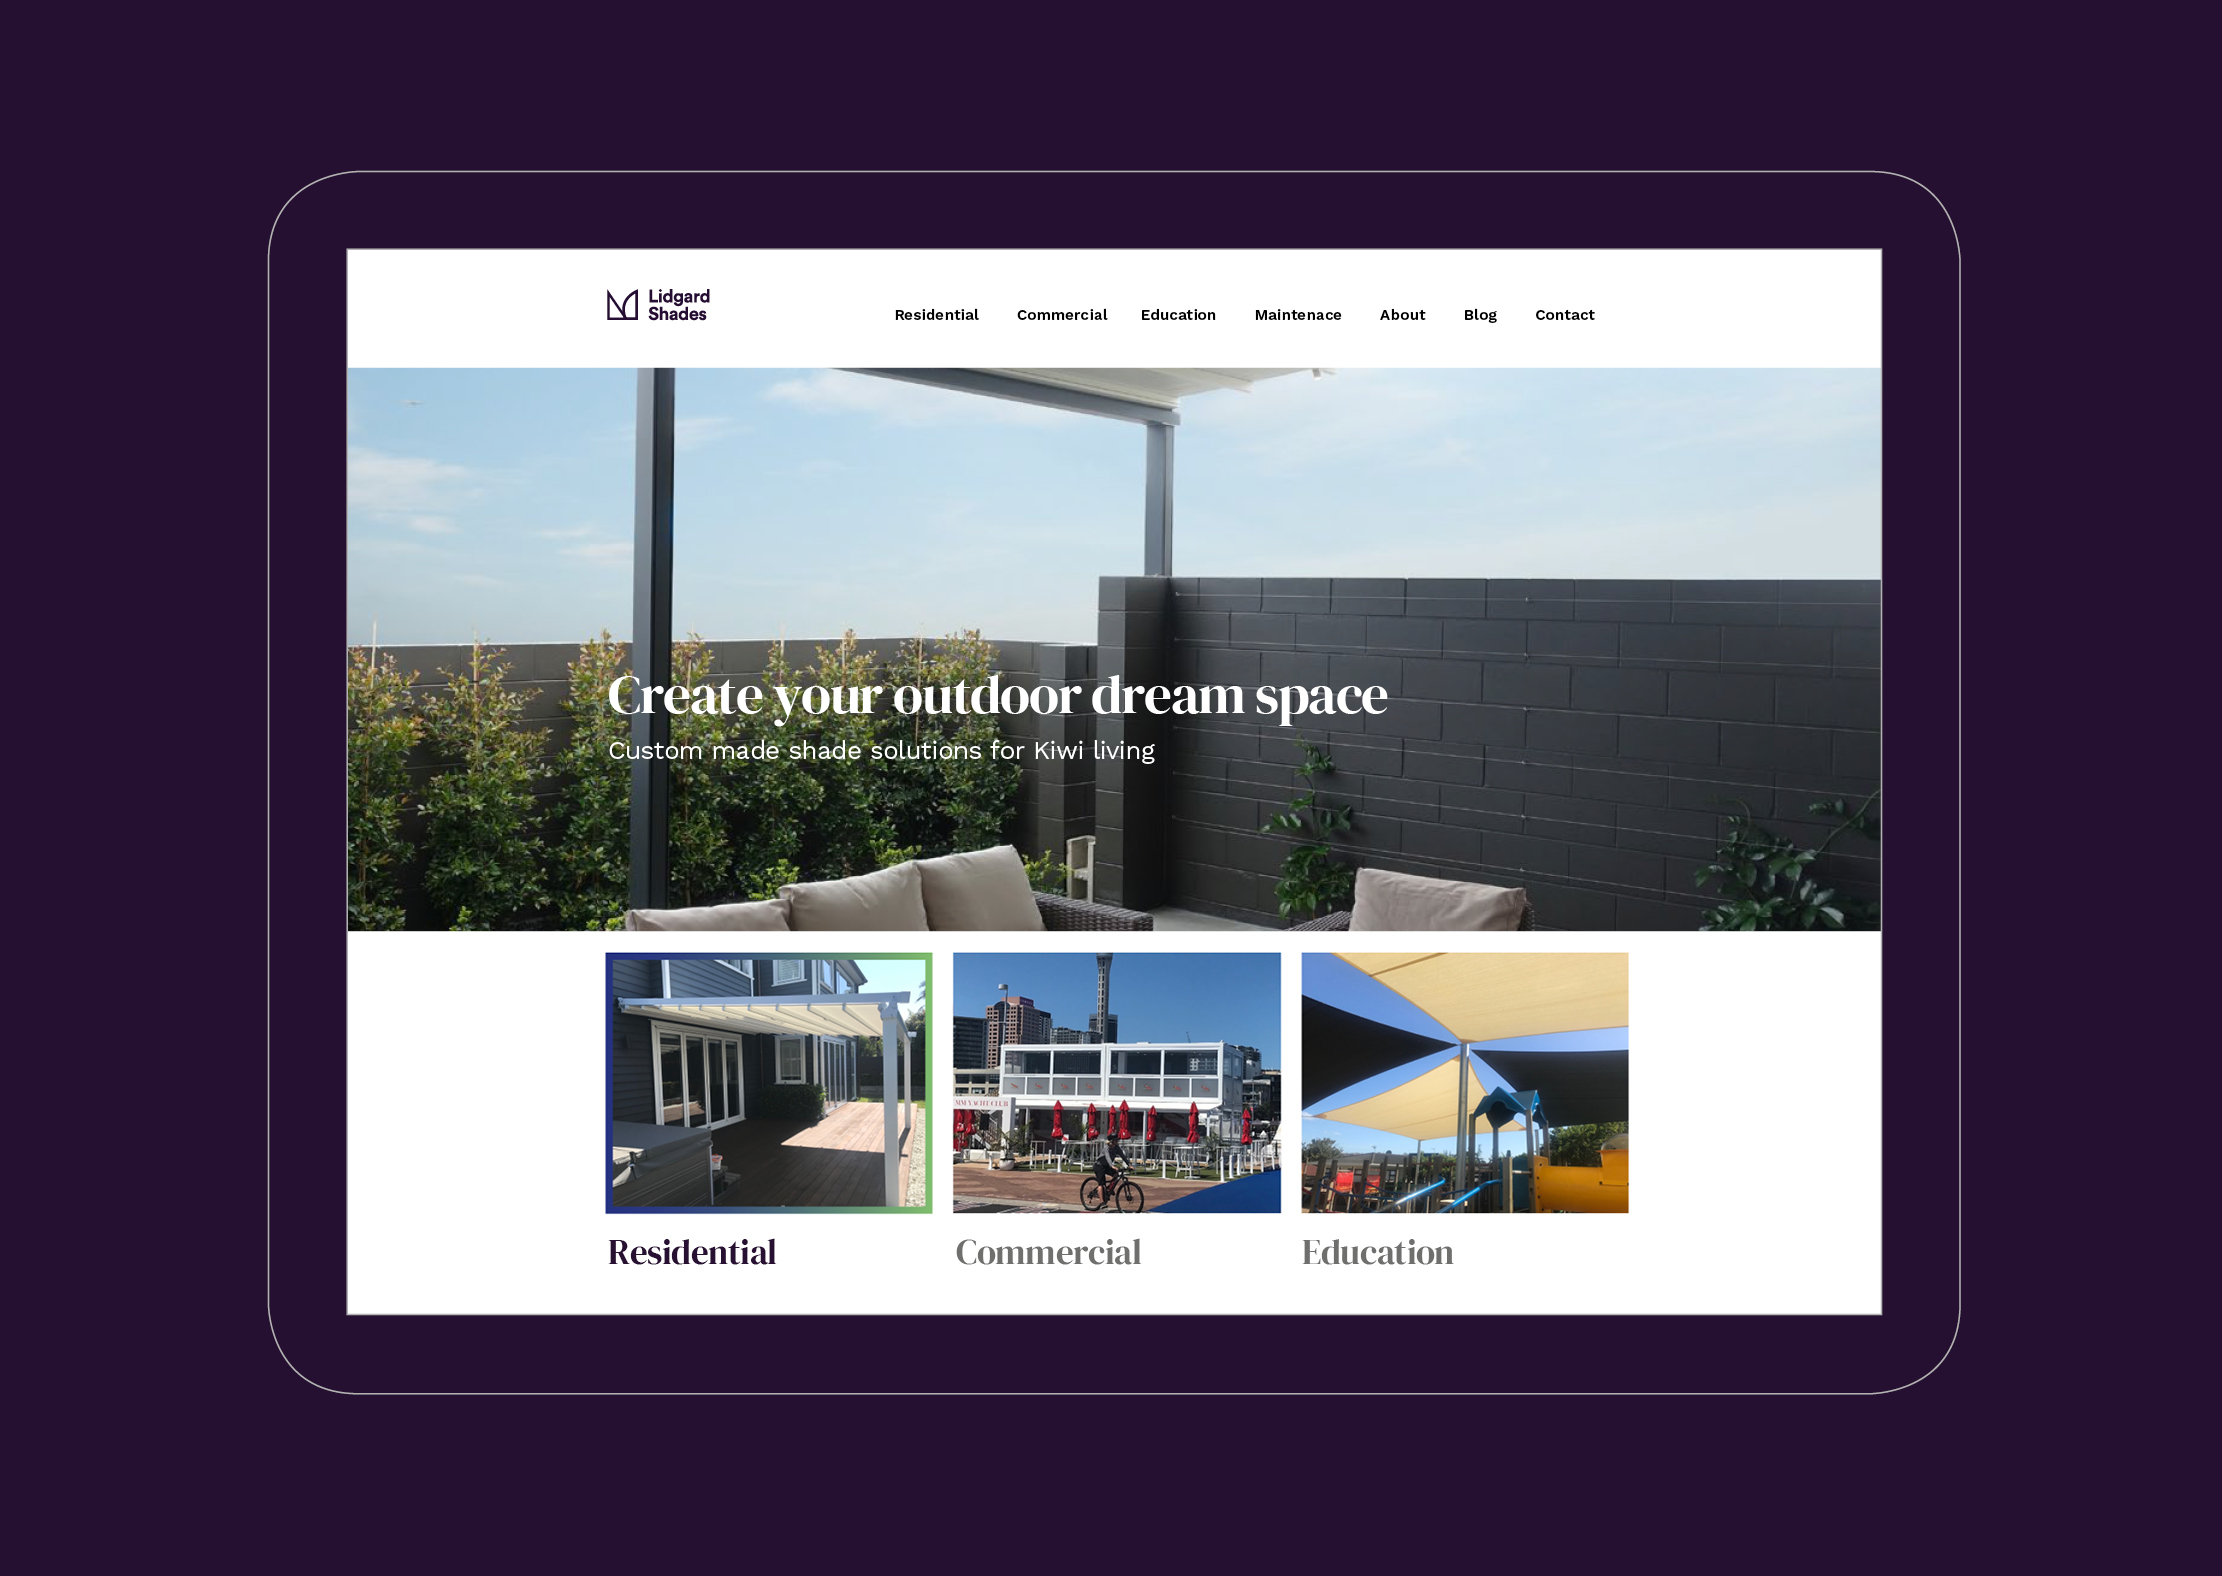 Lidgard Shades Homepage